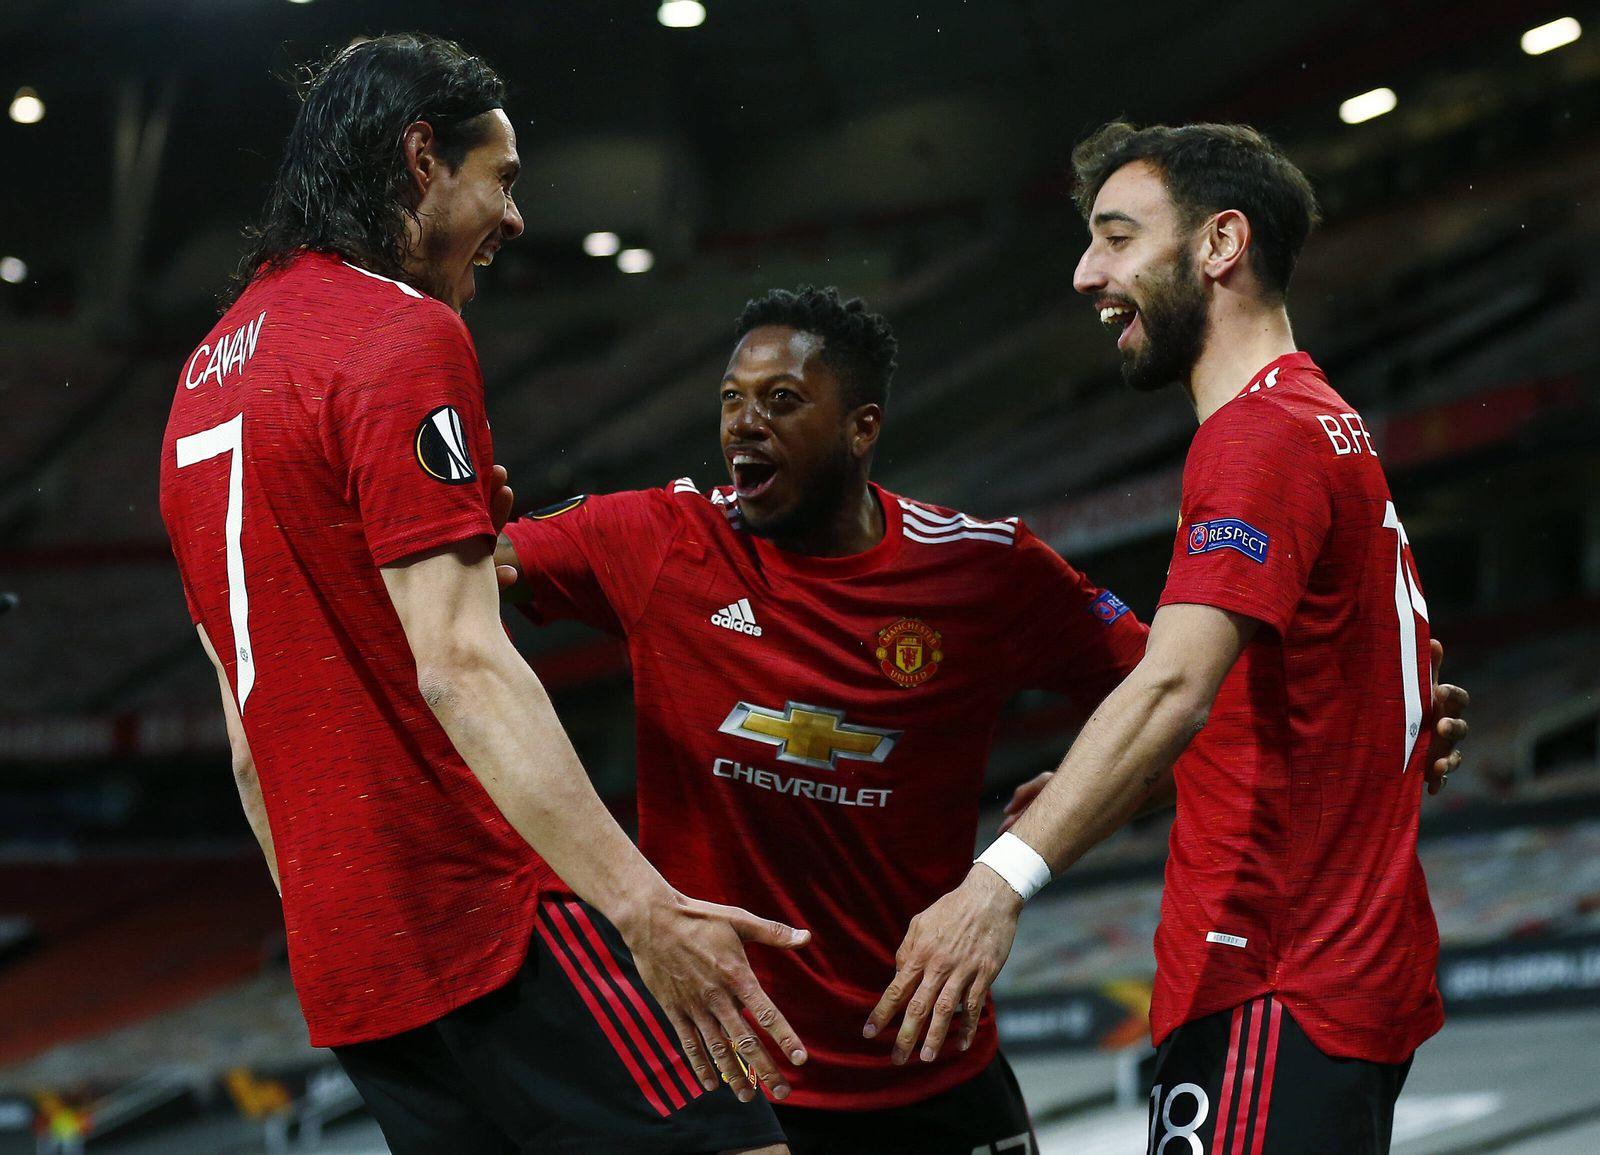 Mandatory Credit: Photo by Matt West/BPI/Shutterstock (11880469ac) Bruno Fernandes of Manchester United, ManU celebrates